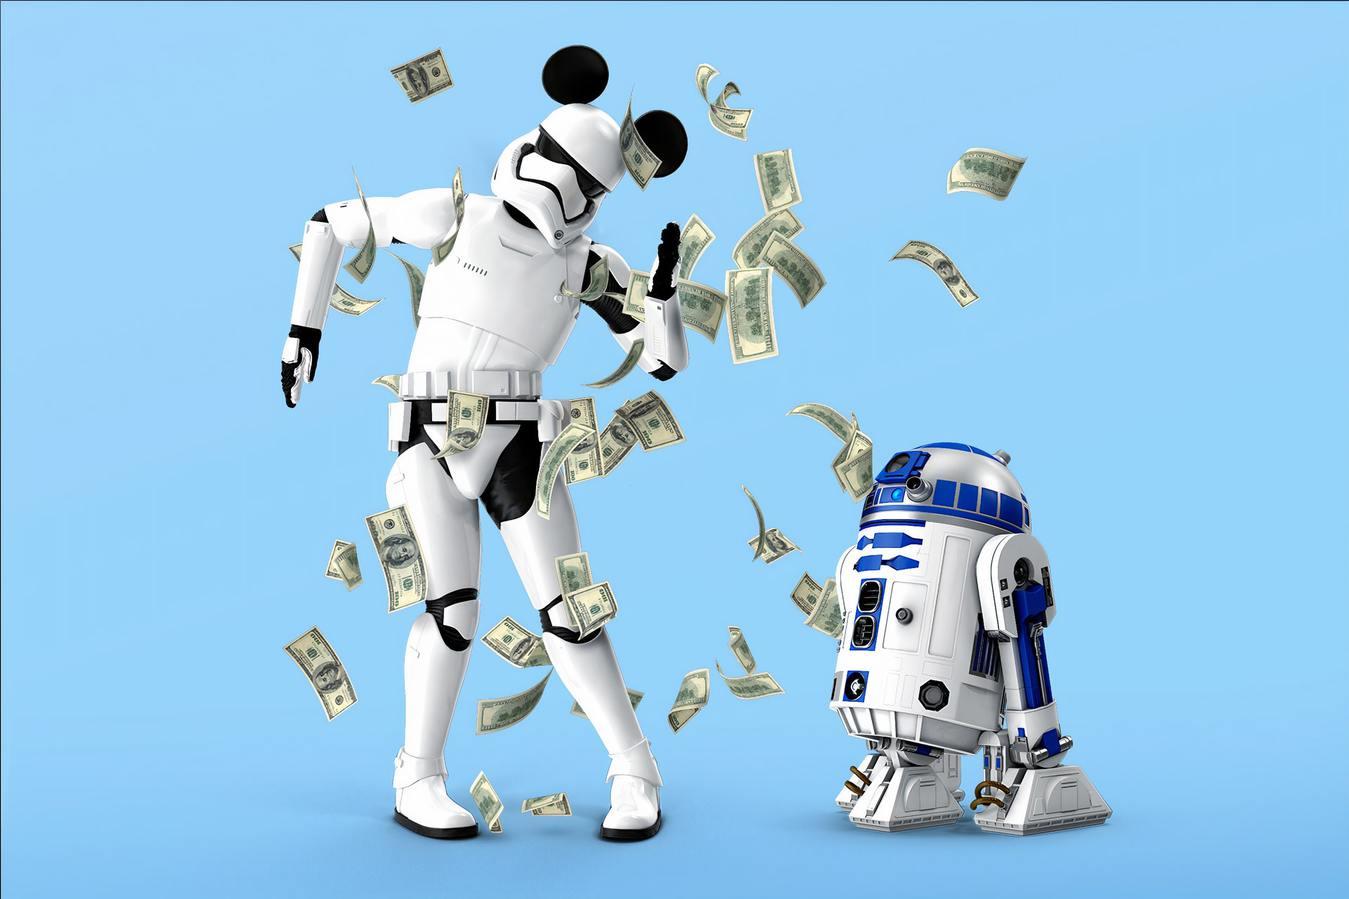 Robot che ballano mentre cadono soldi